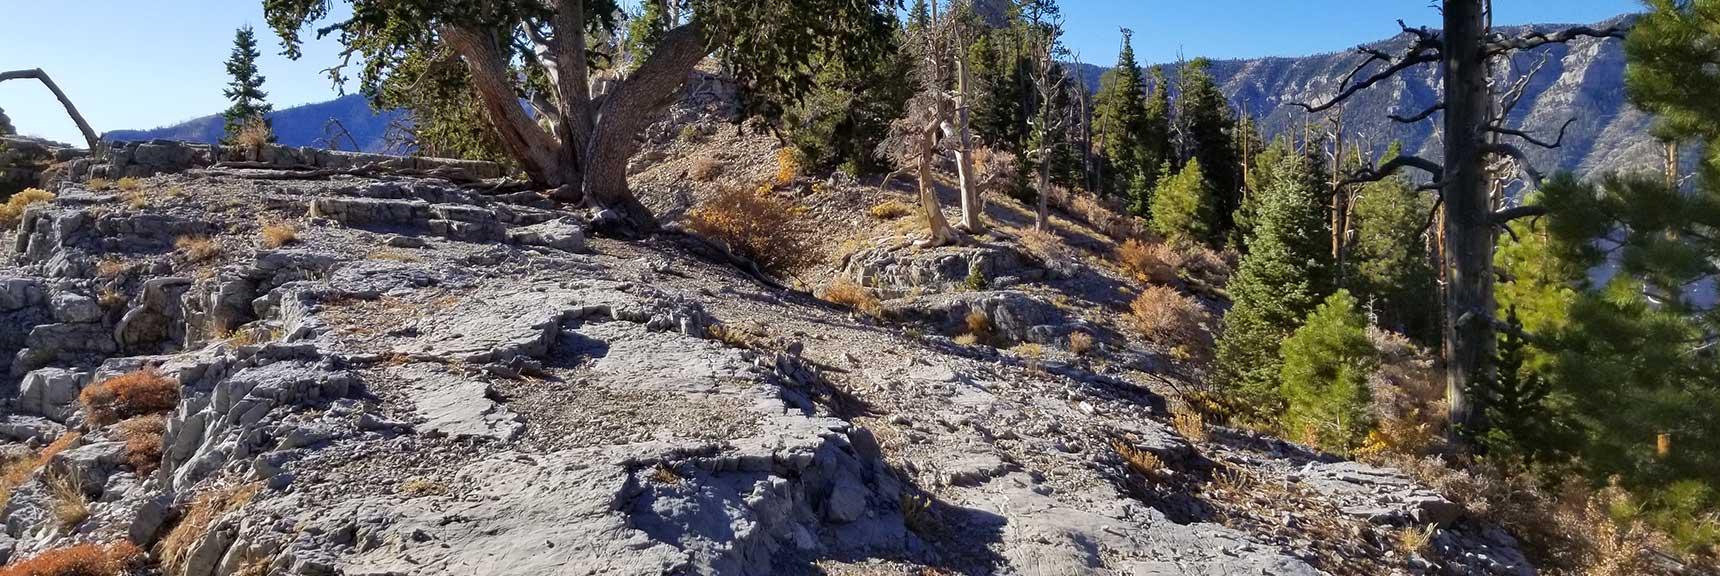 Starting Up Cockscomb Ridge trail, Cockscomb Ridge Wilderness Circuit in Mt. Charleston Wilderness, Nevada